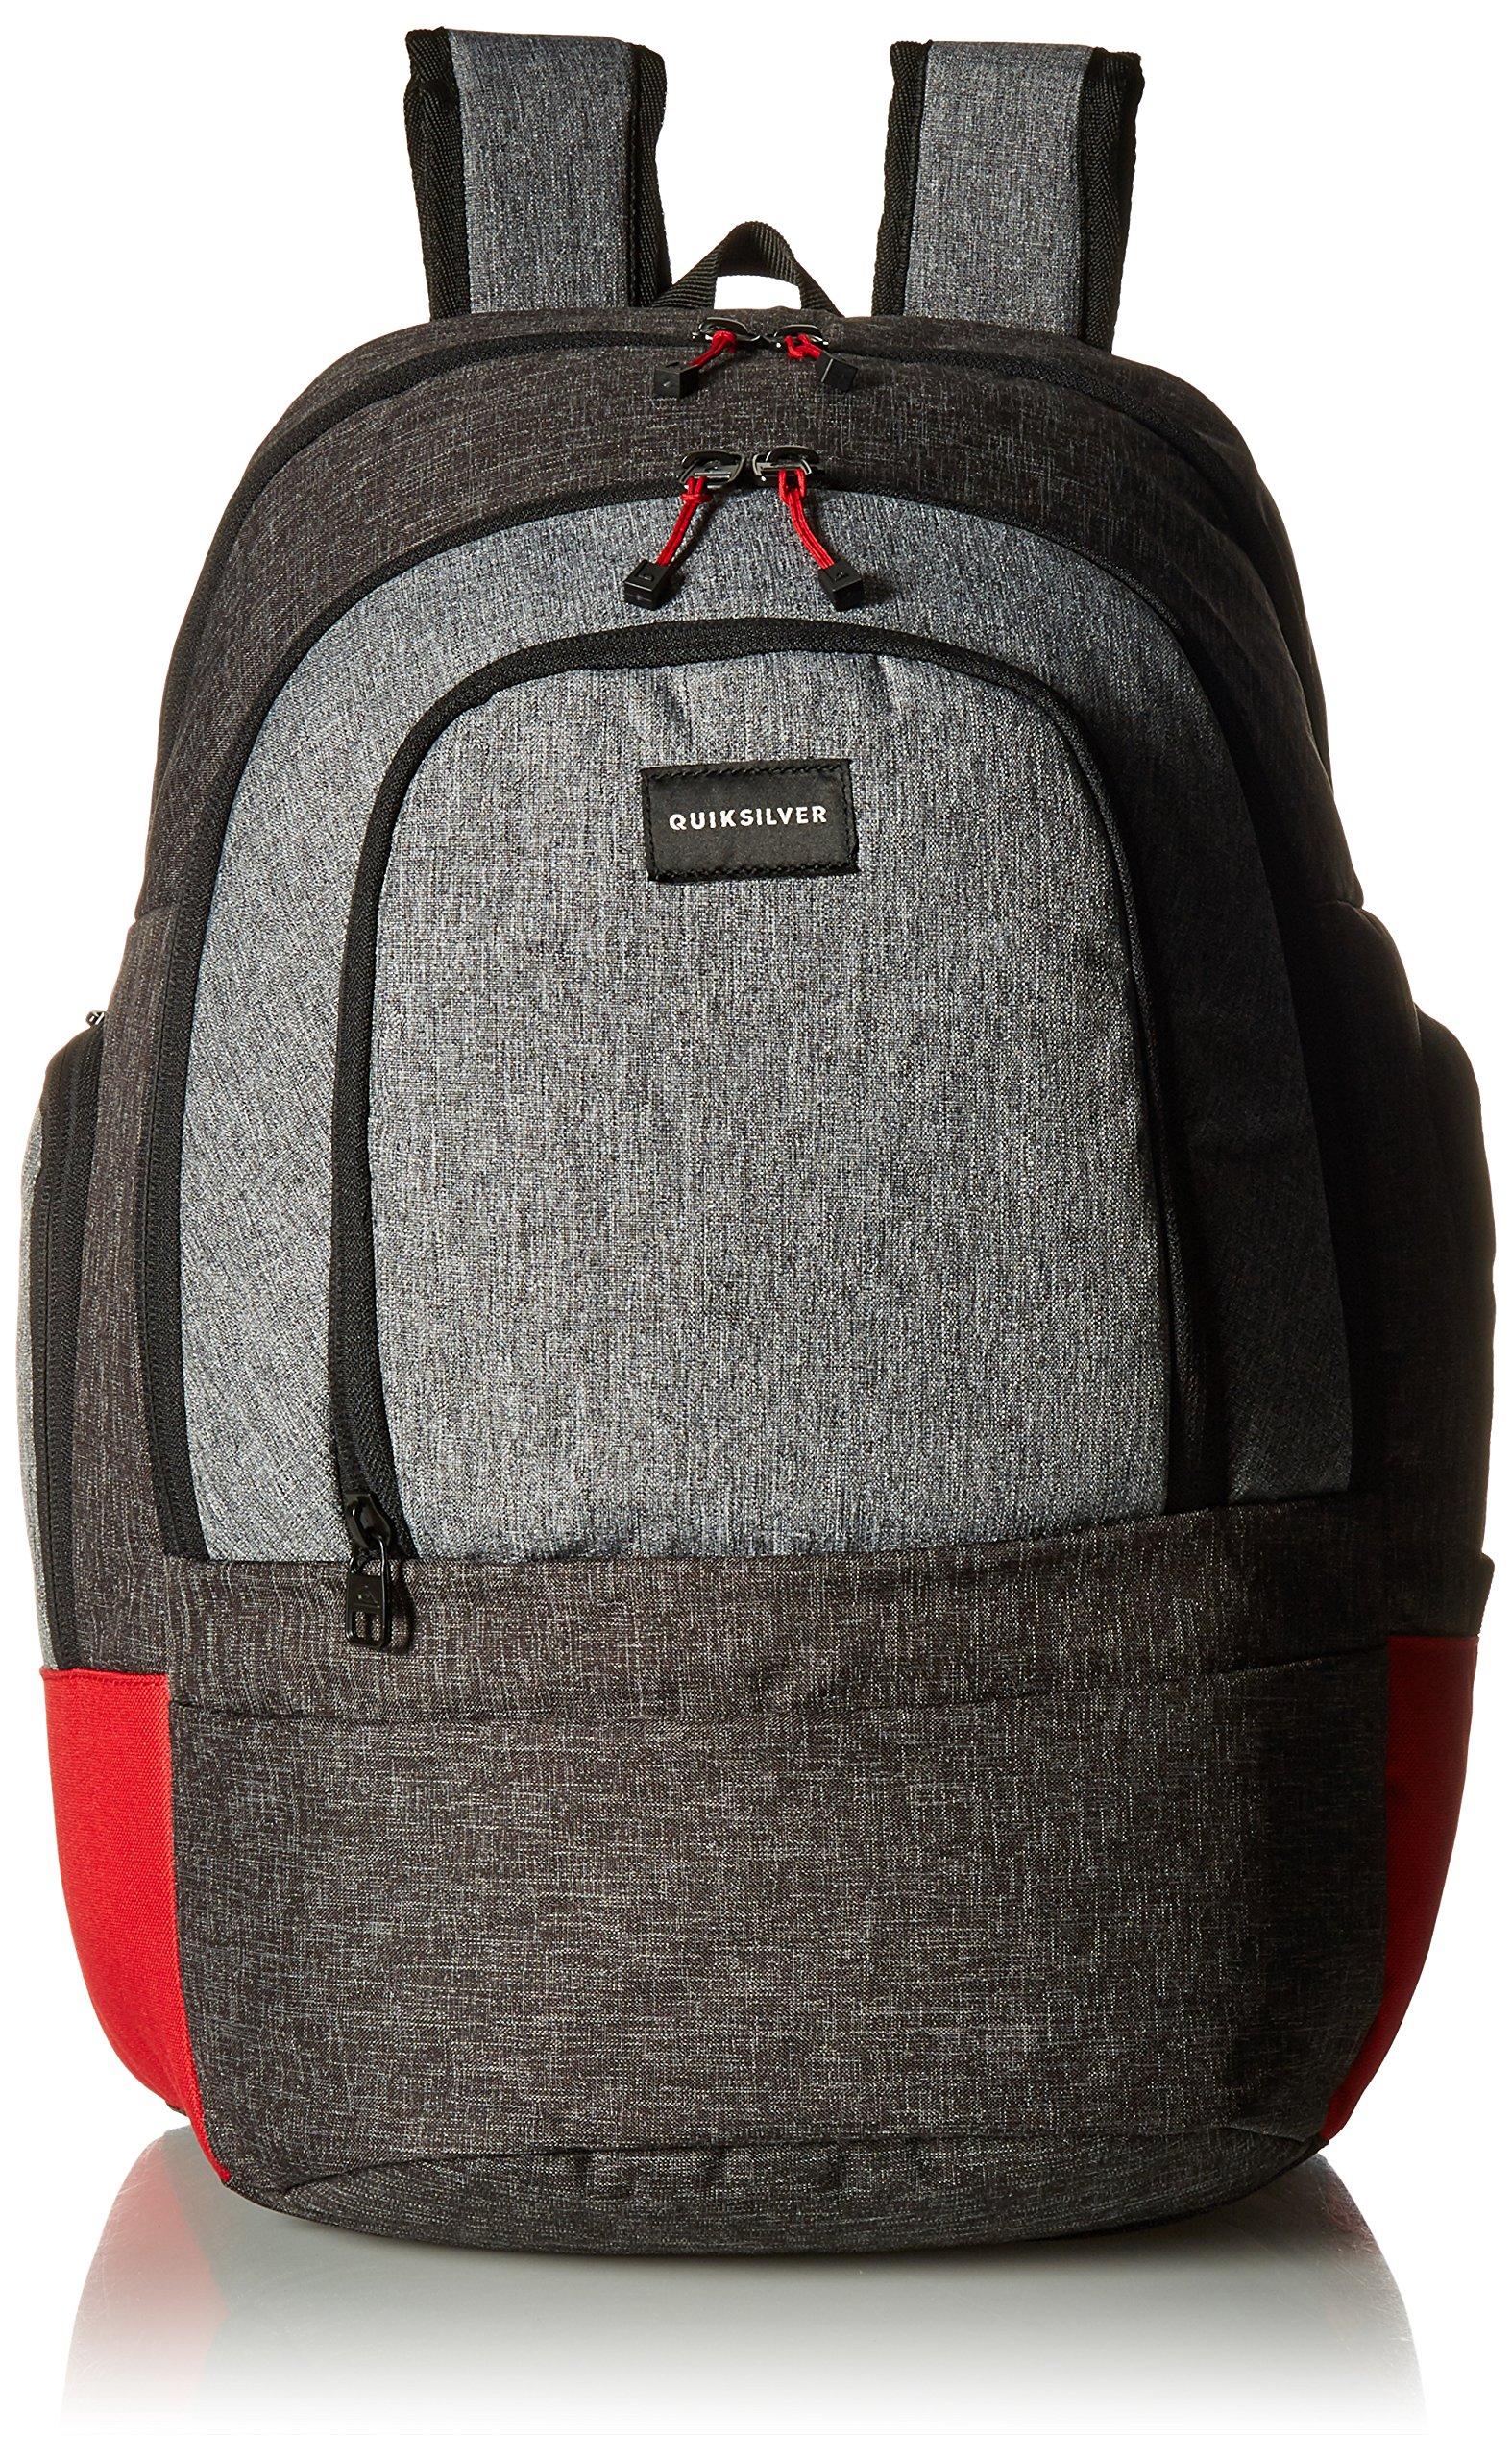 Quiksilver Unisex 1969 Special Backpack, Quik Red